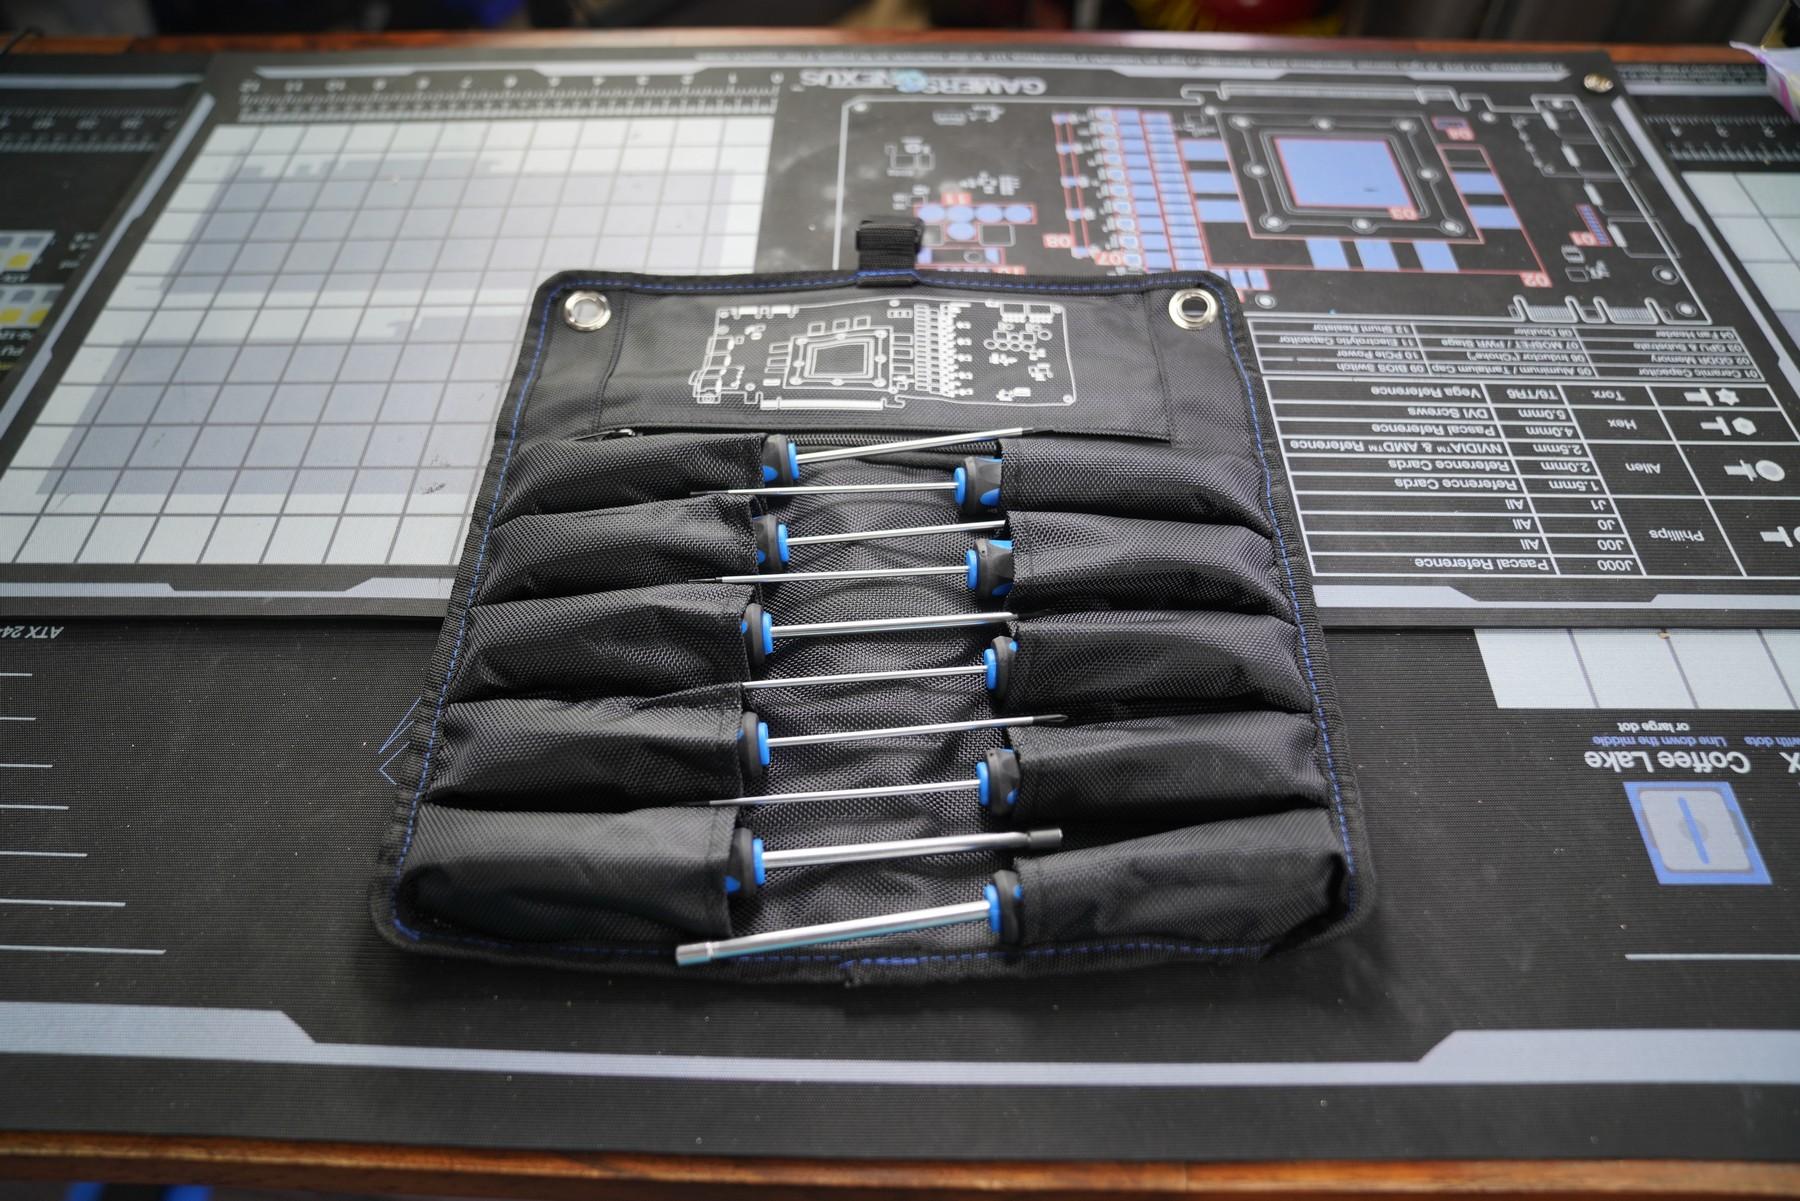 gn-toolkit-store-05.jpg